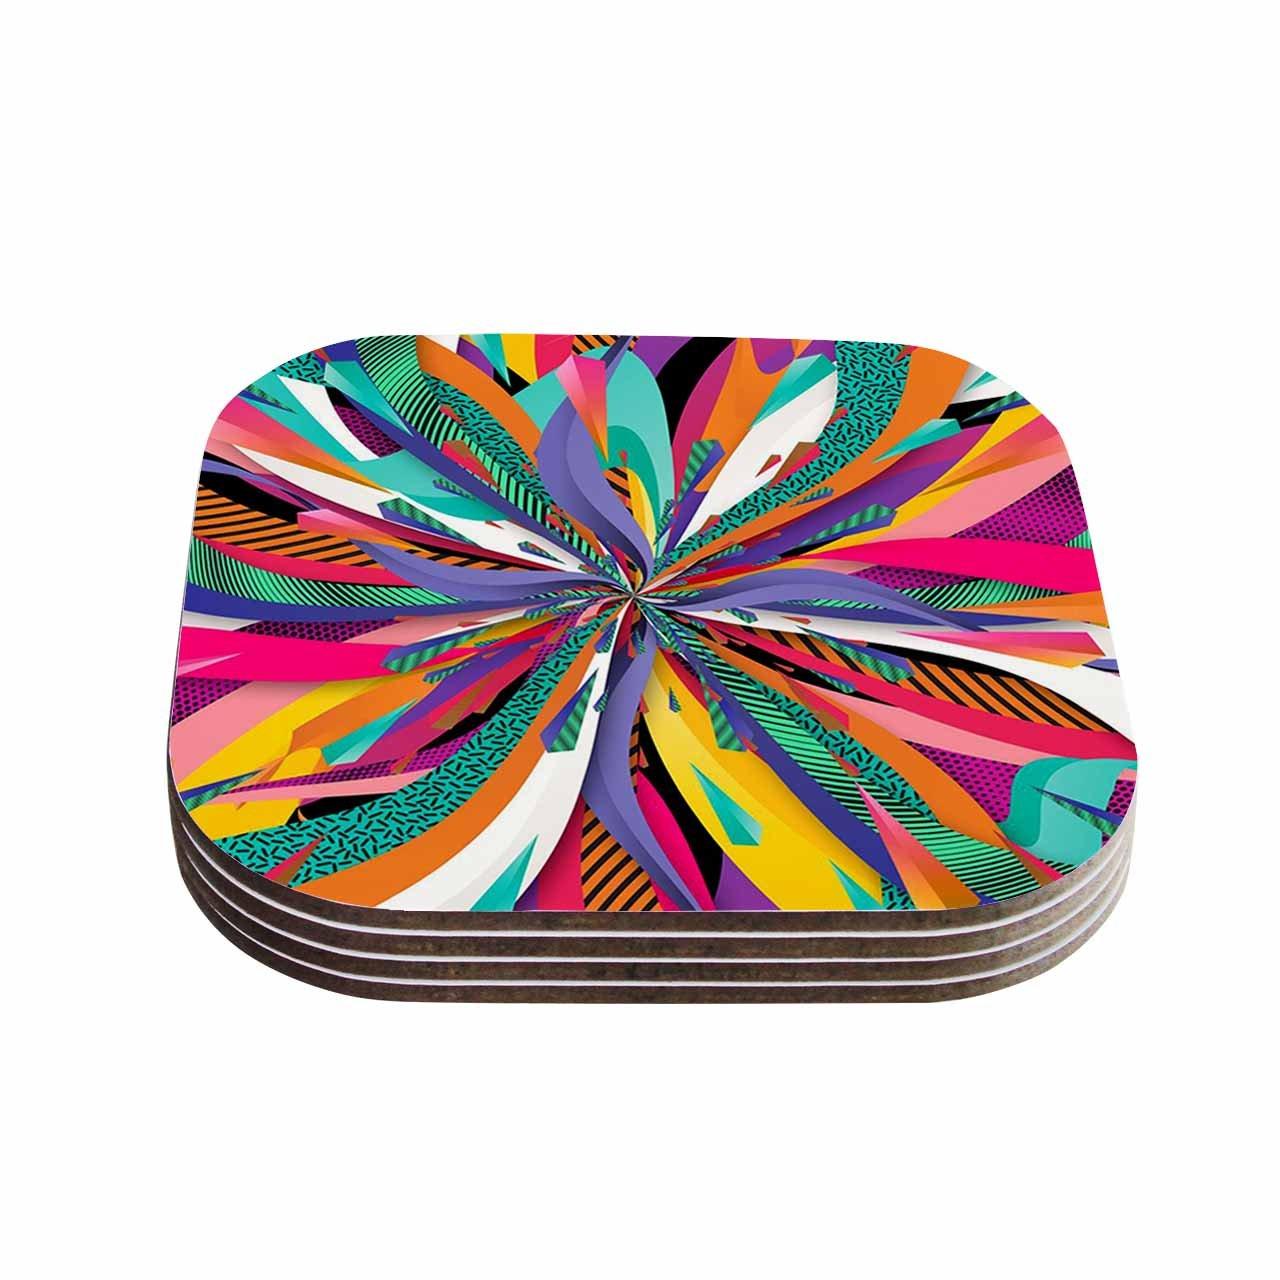 KESS InHouse Danny IvanPop Abstract Coasters Multicolor Set of 4 4 x 4